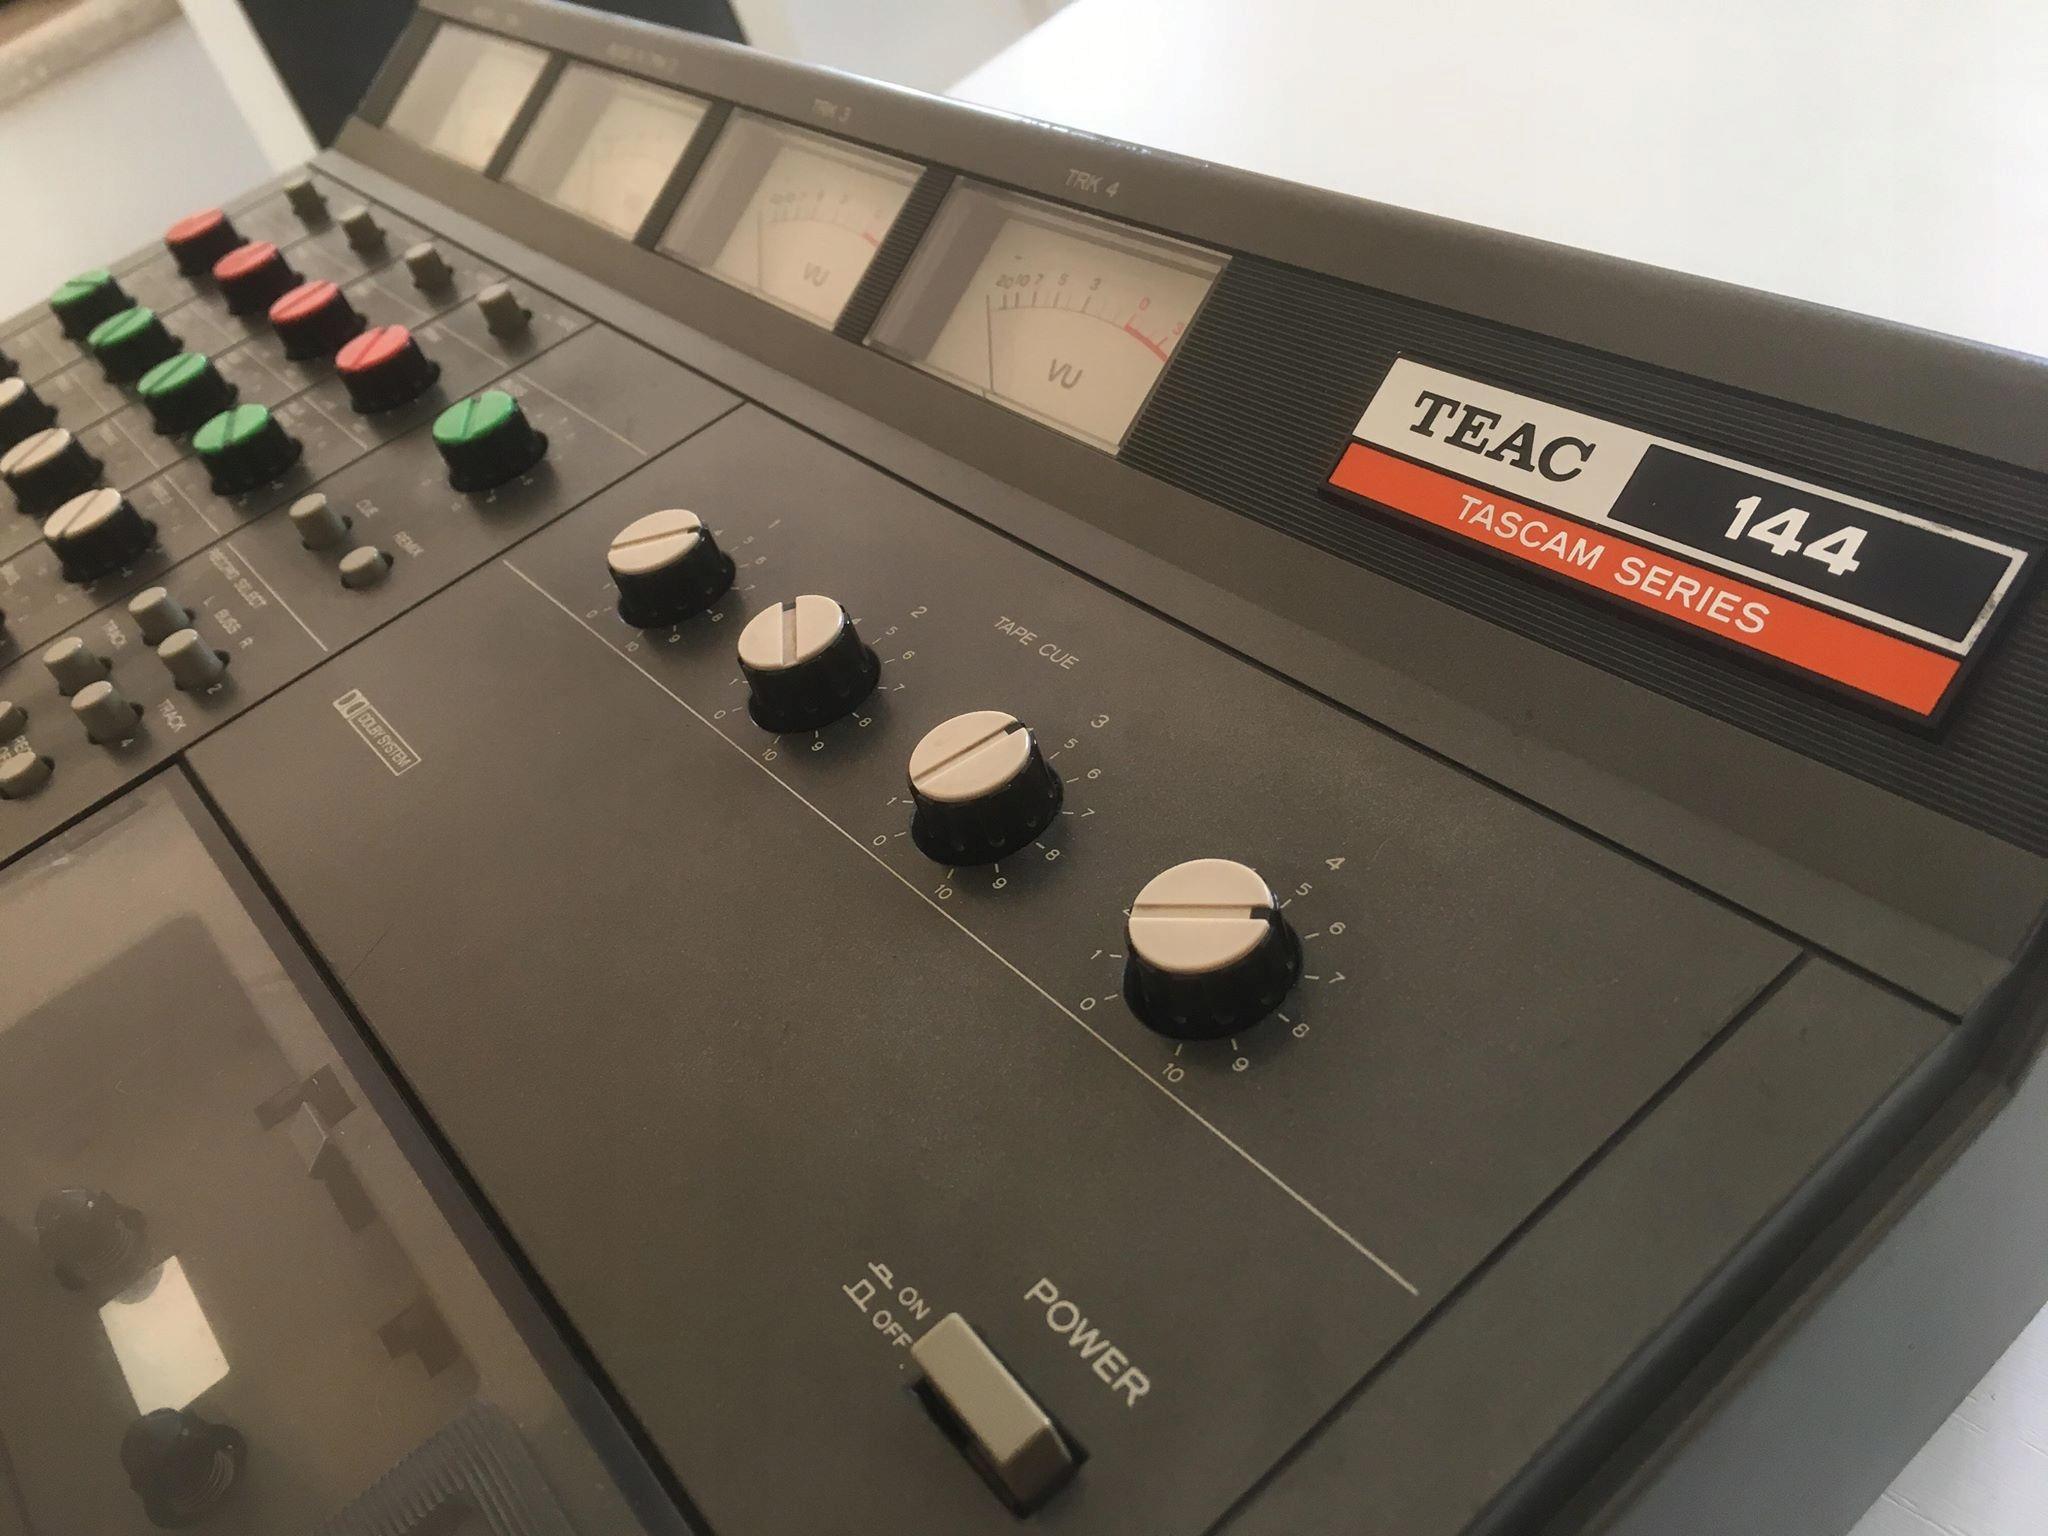 TEAC 144 Portastudio 4 track recorder